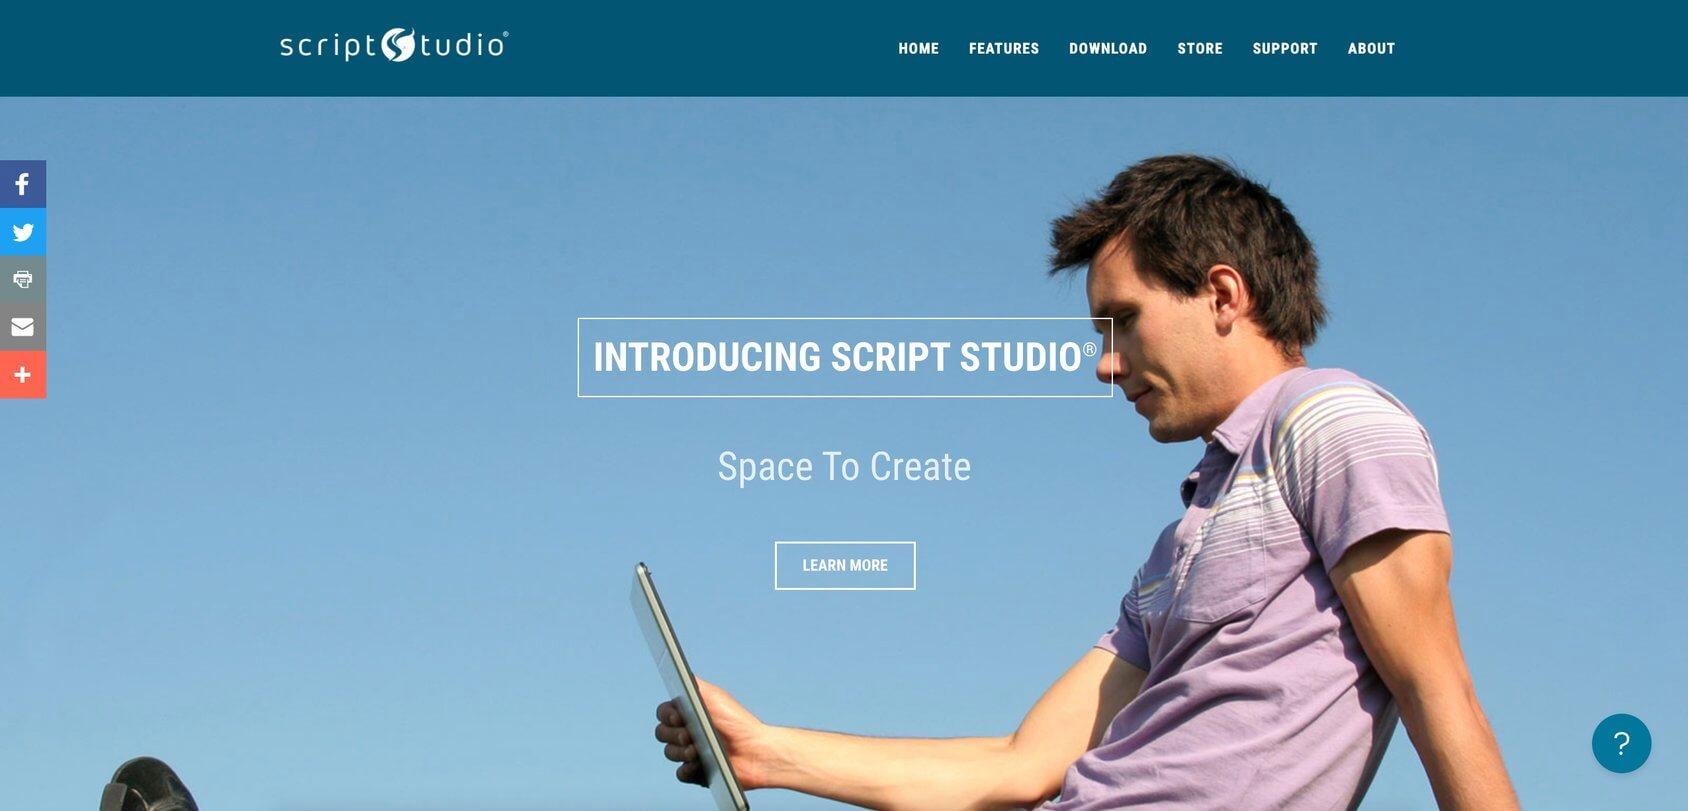 Script Studio homepage